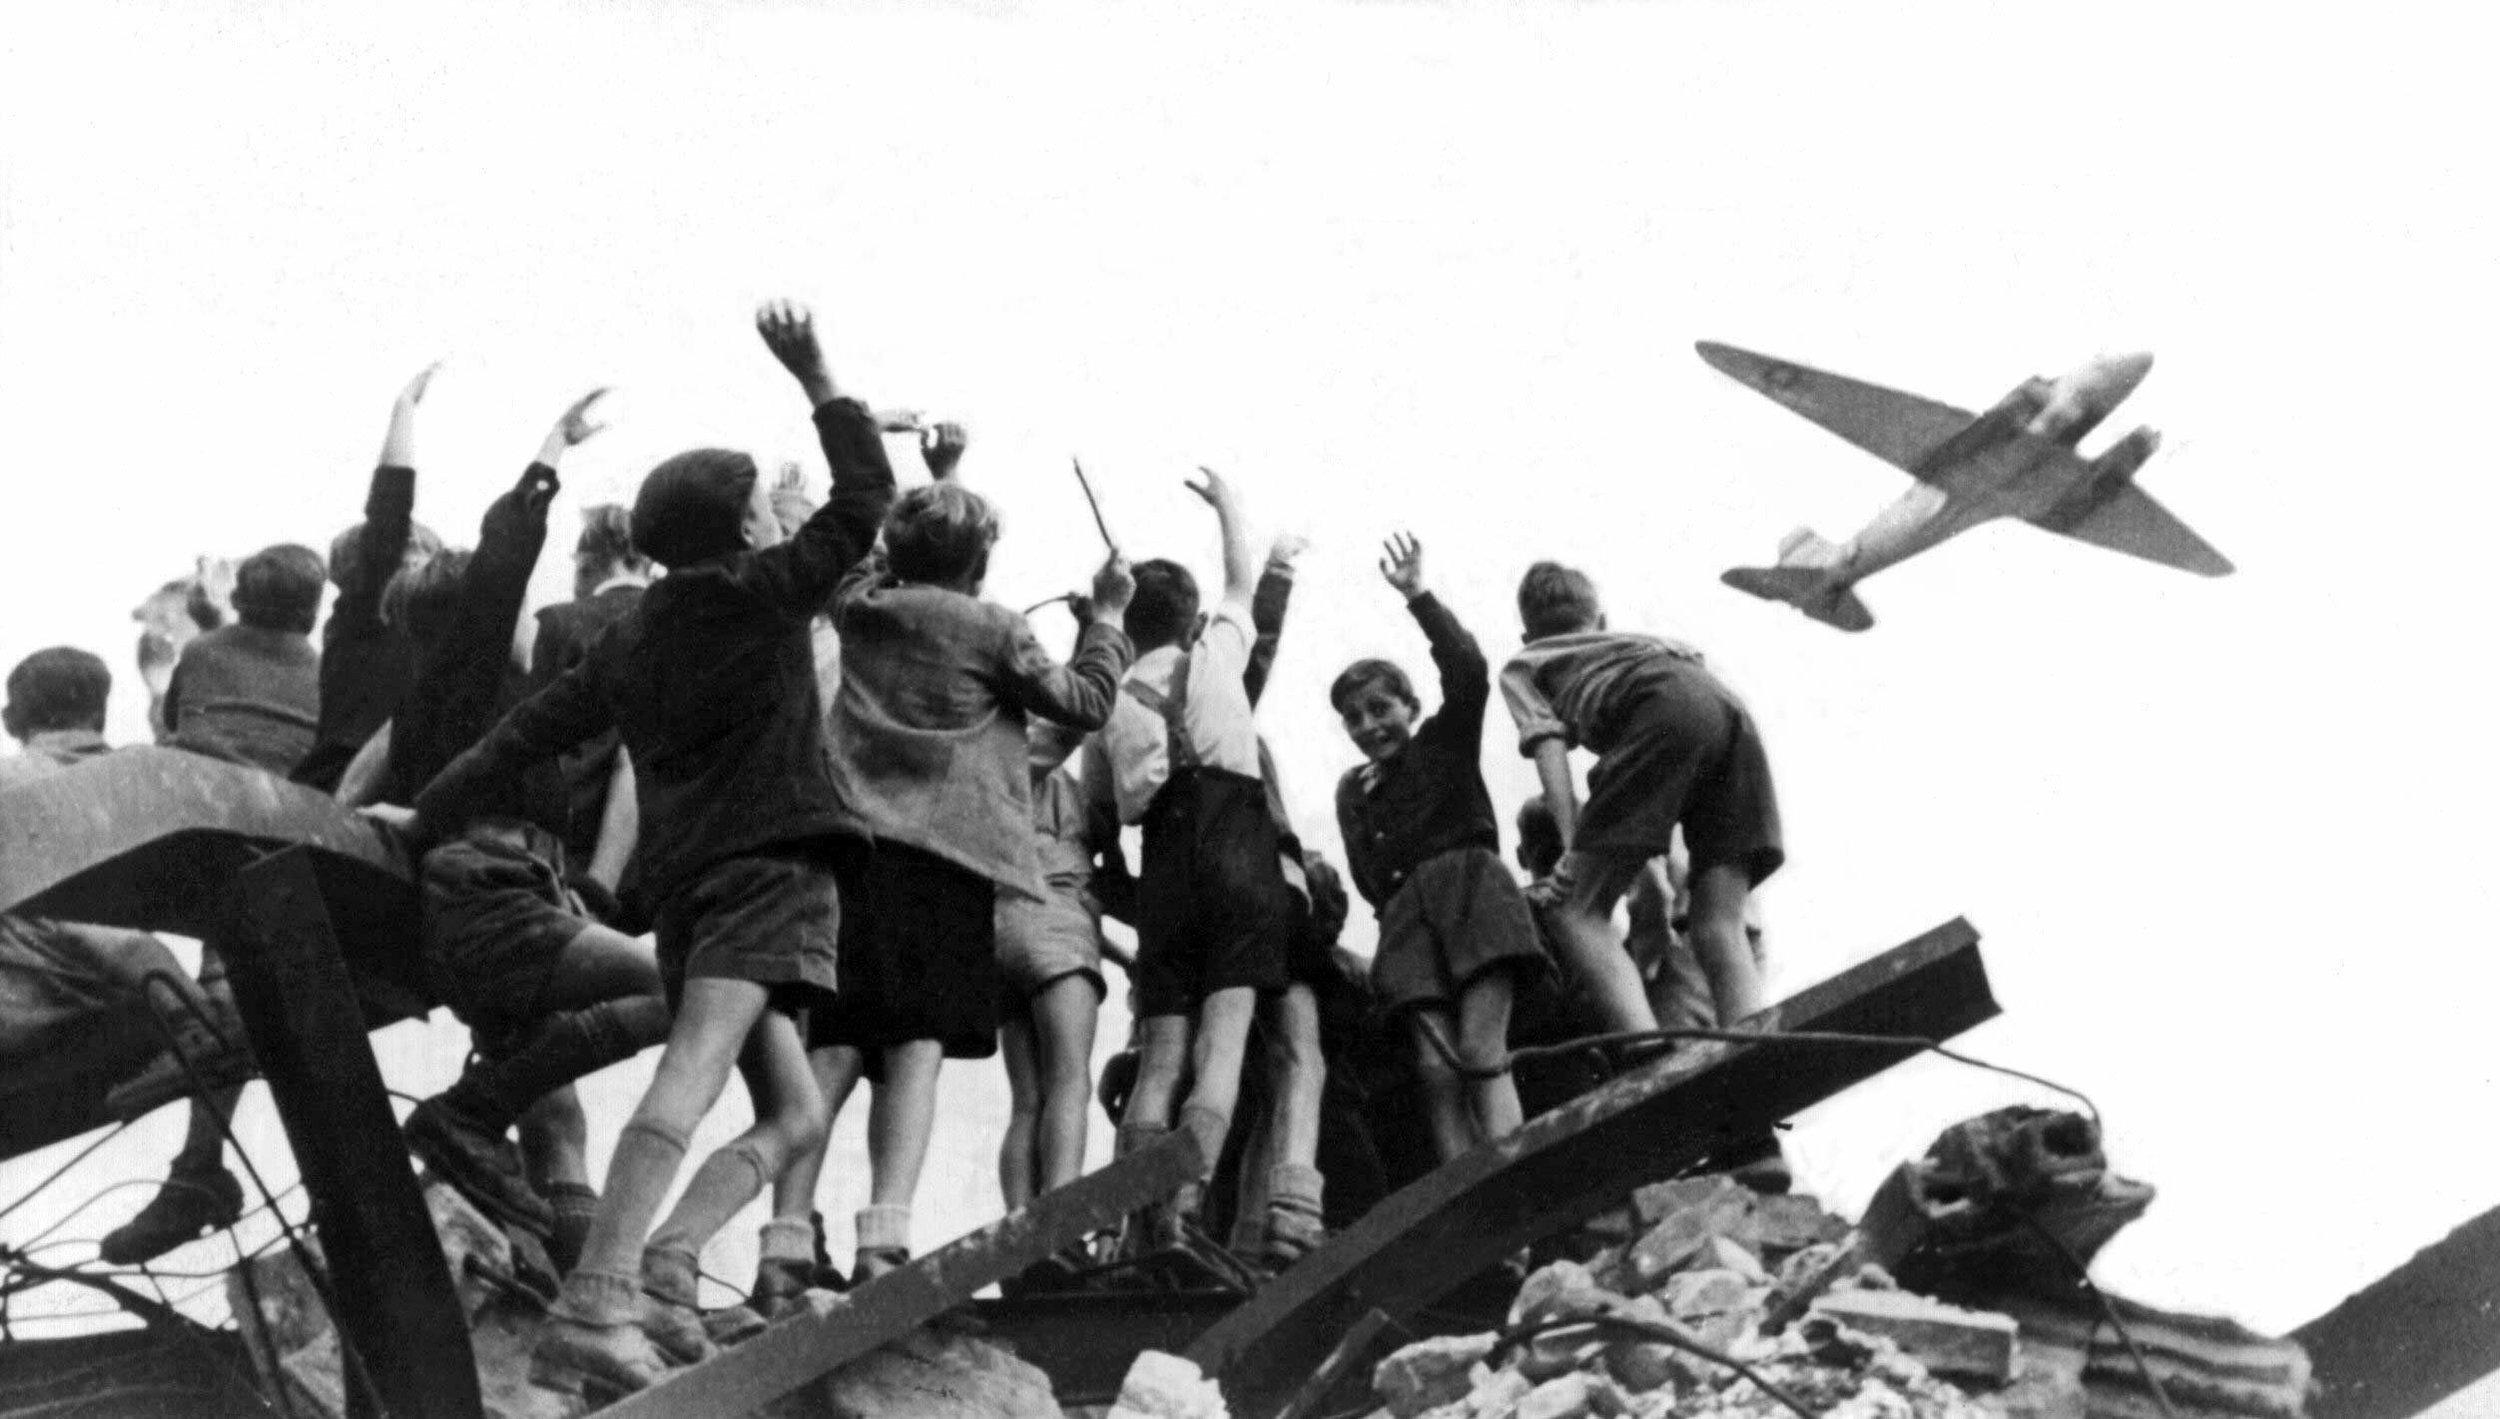 Berlin Airlift: Children Hope for Chocolates (July 1948)  Bildarchiv Preußischer Kulturbesitz